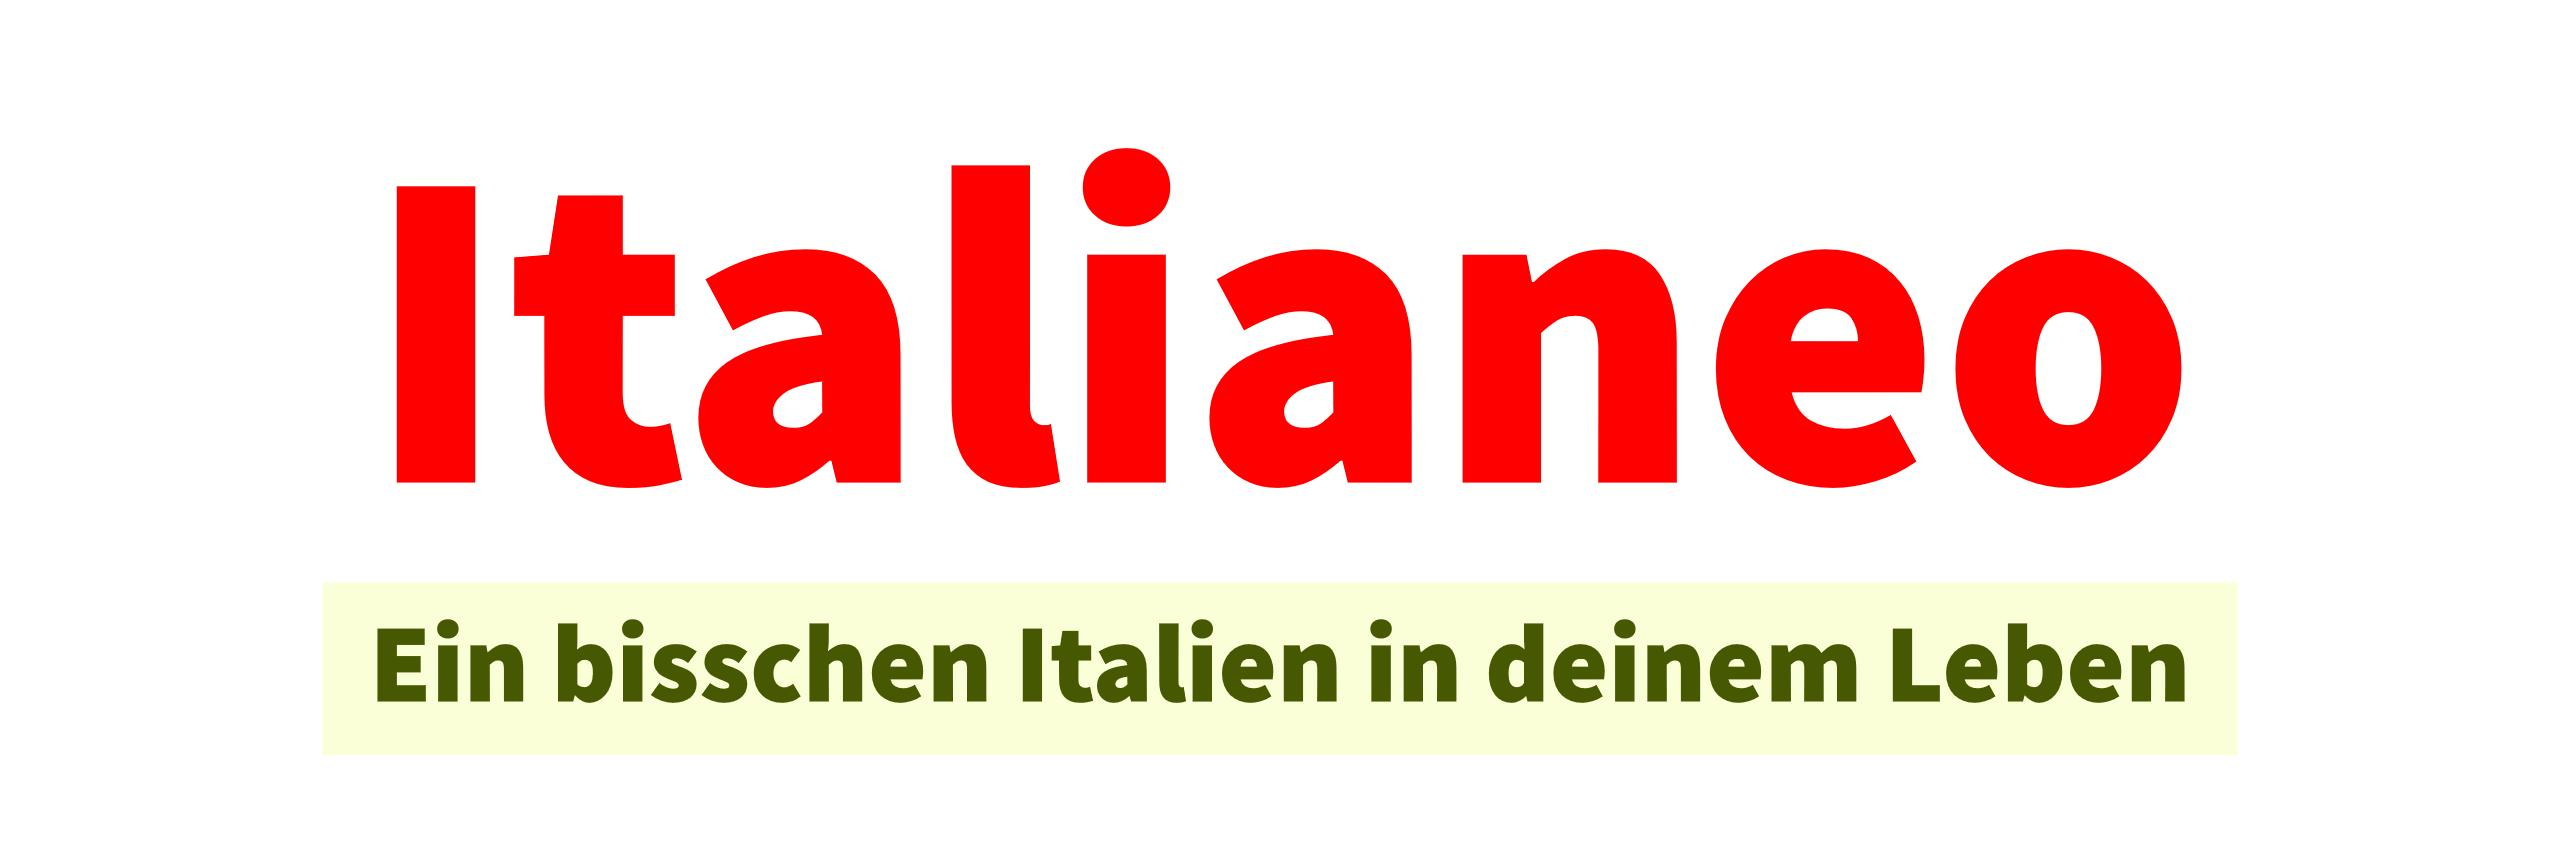 Italianeo